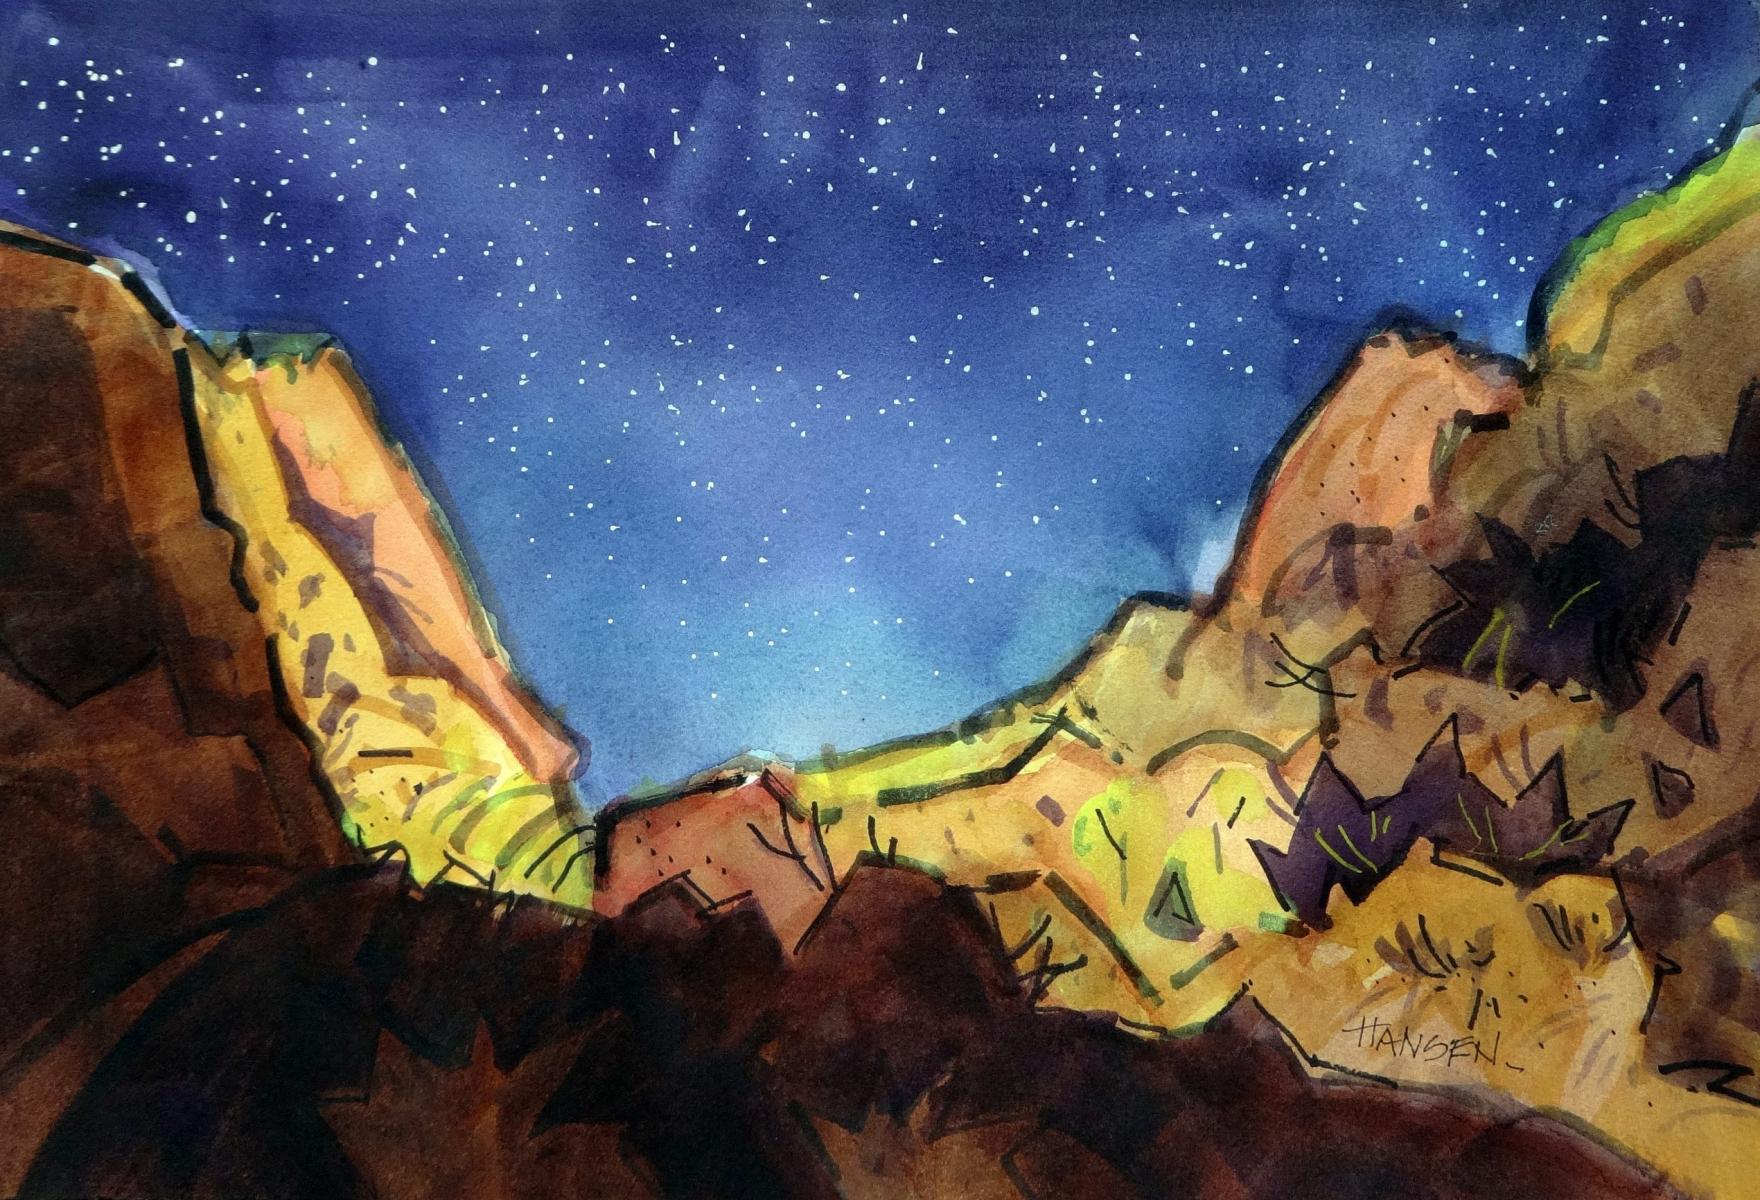 CLEAR SKY, Original Watercolor, 15x22